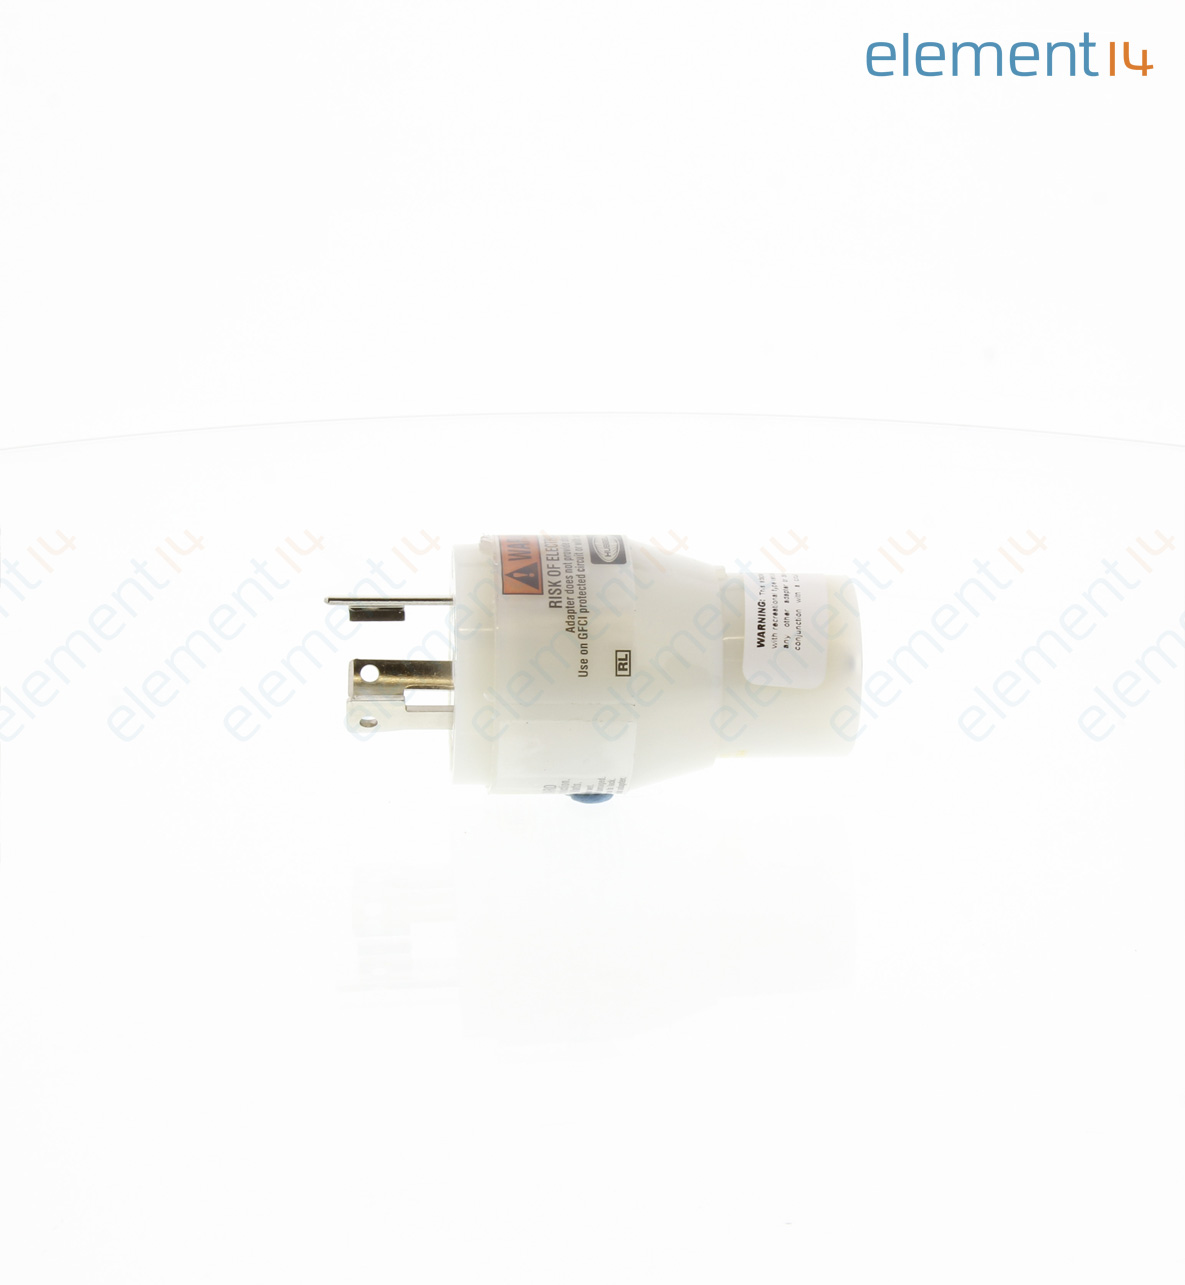 Hbl31cm29 Hubbell Wiring Devices Adaptador De Clavija Nema L5 Philippines Agregar Para Comparar